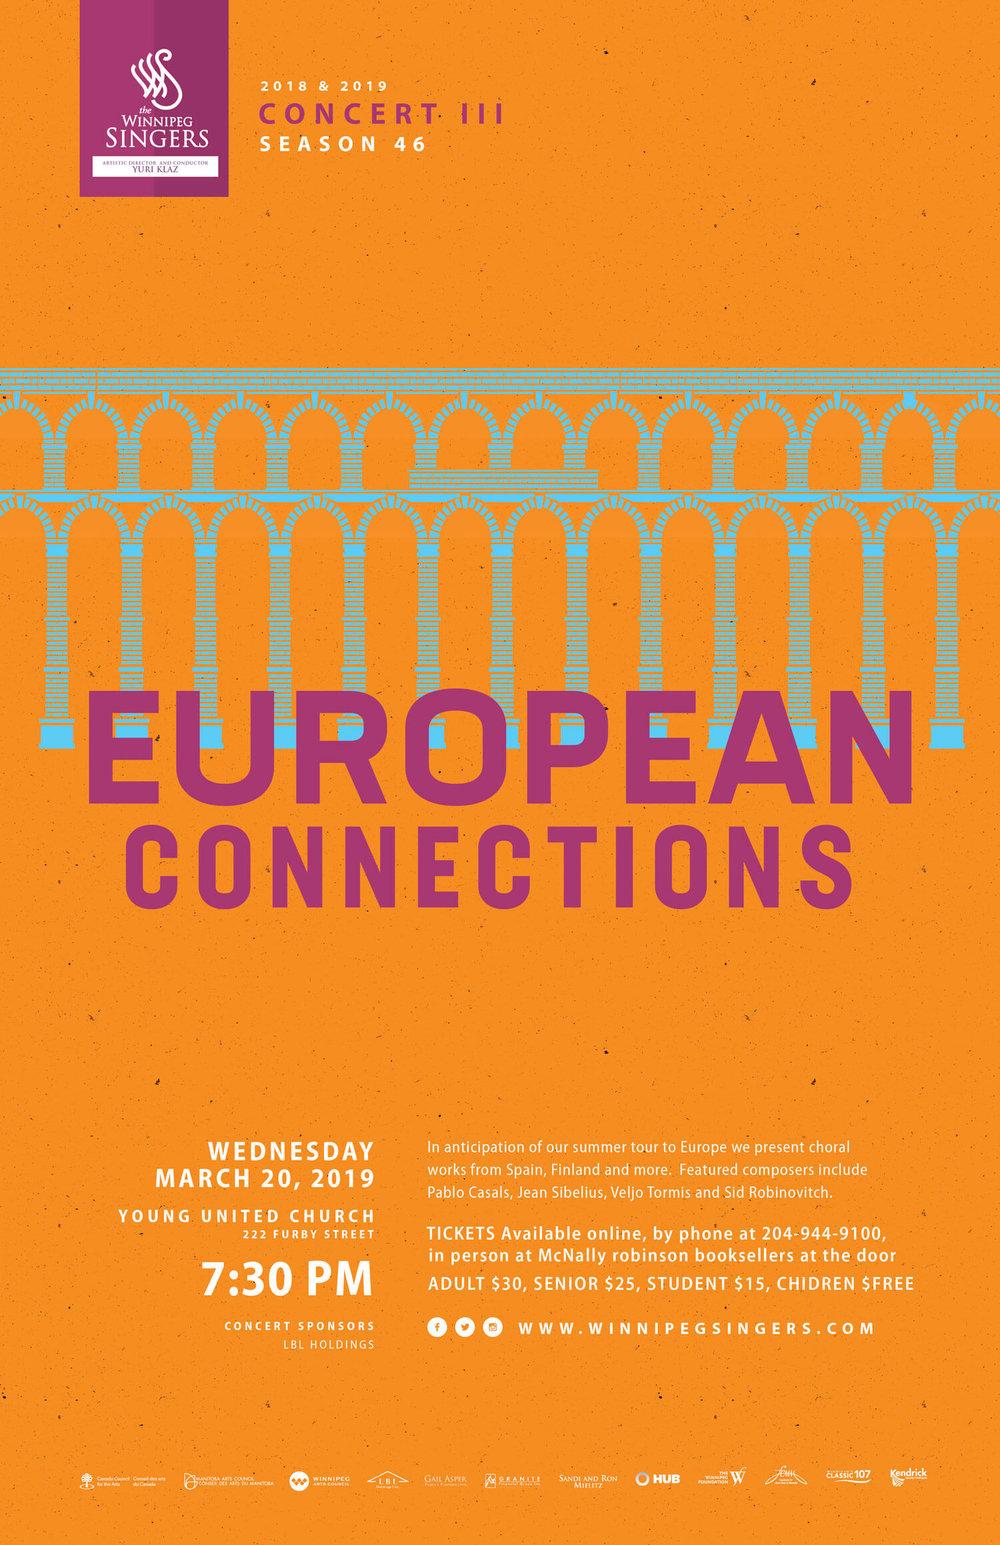 Winnipeg Singers - European Connections Concert